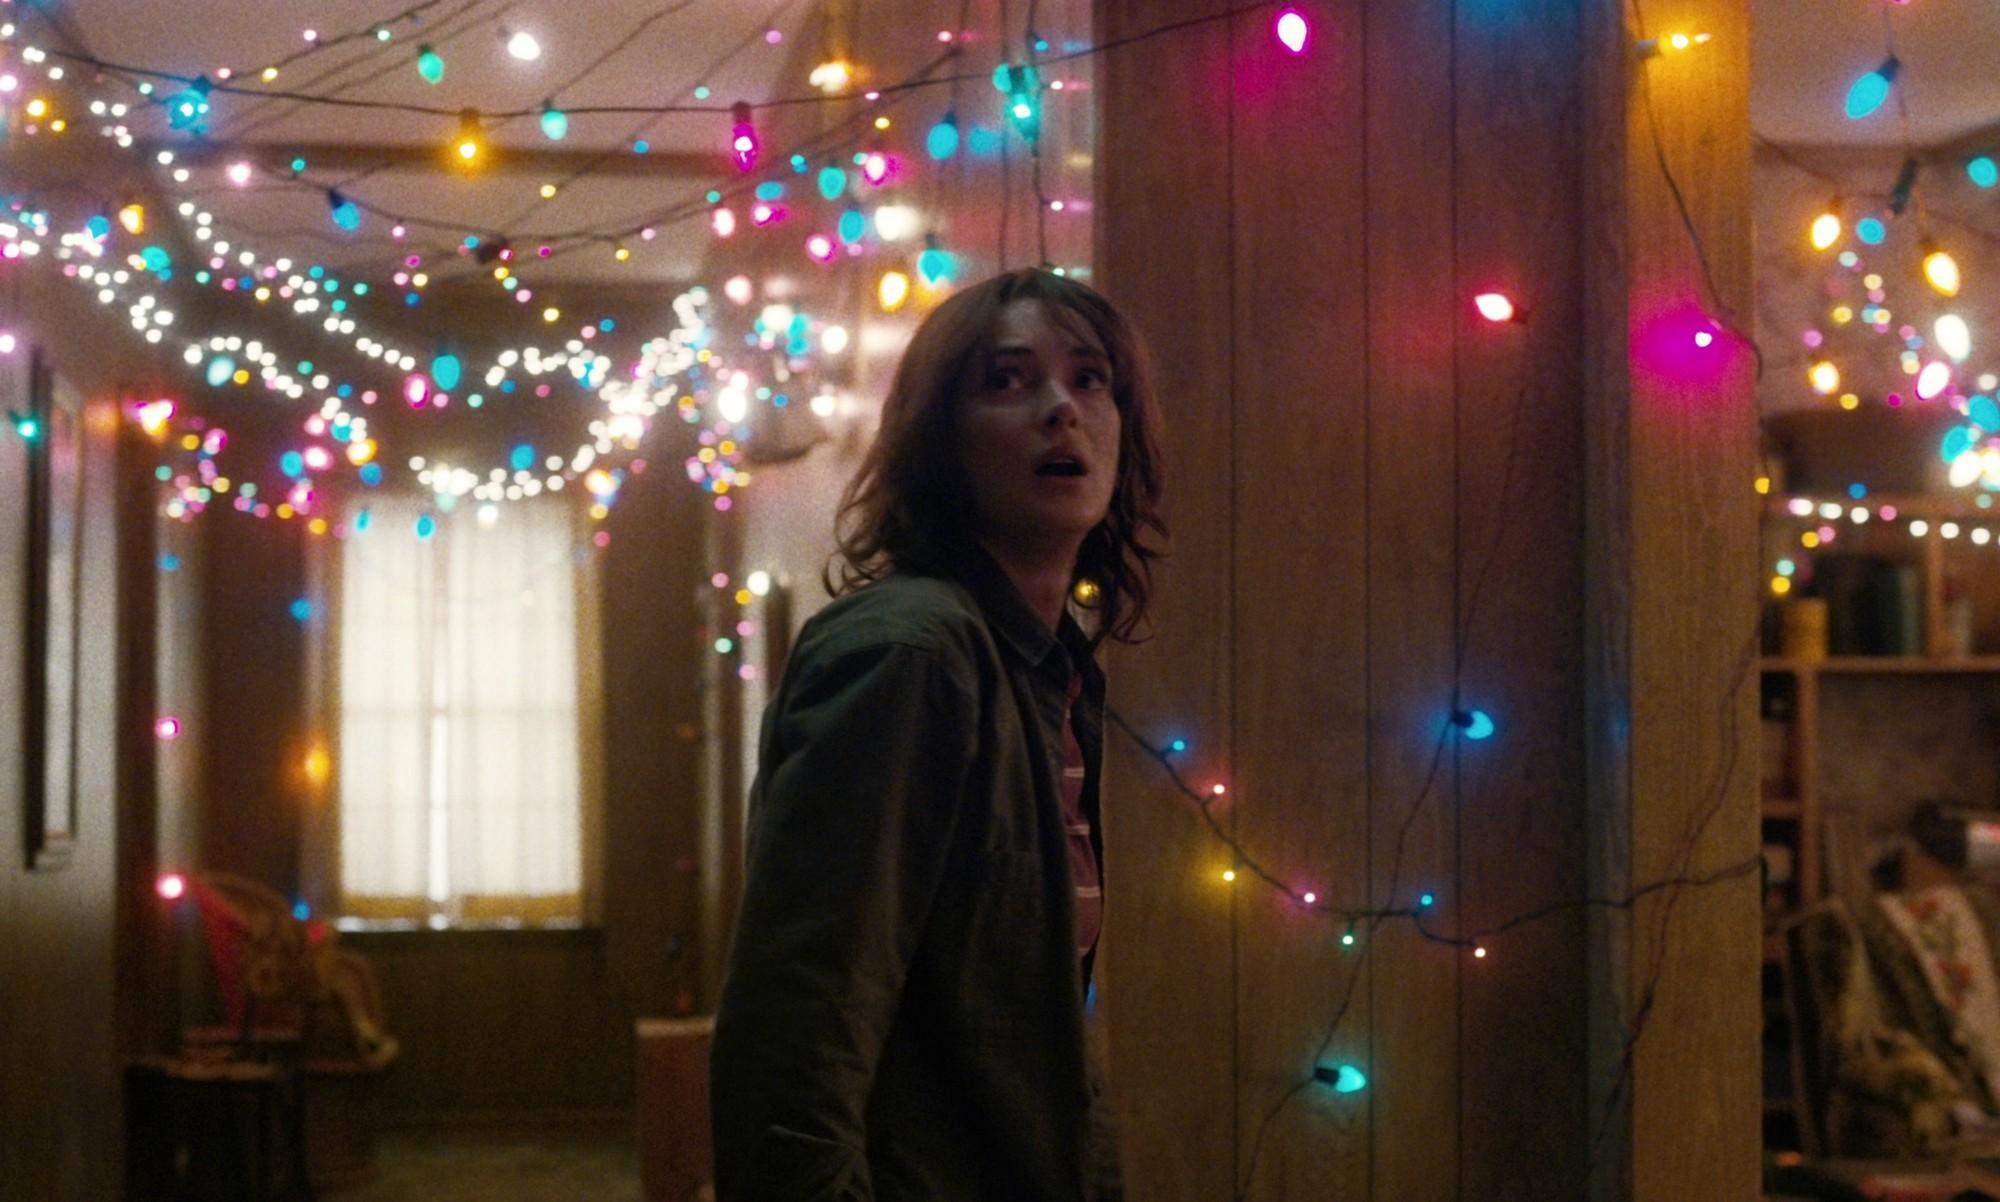 La actriz Winona Ryder, en la serie de Netflix 'Stranger Things'